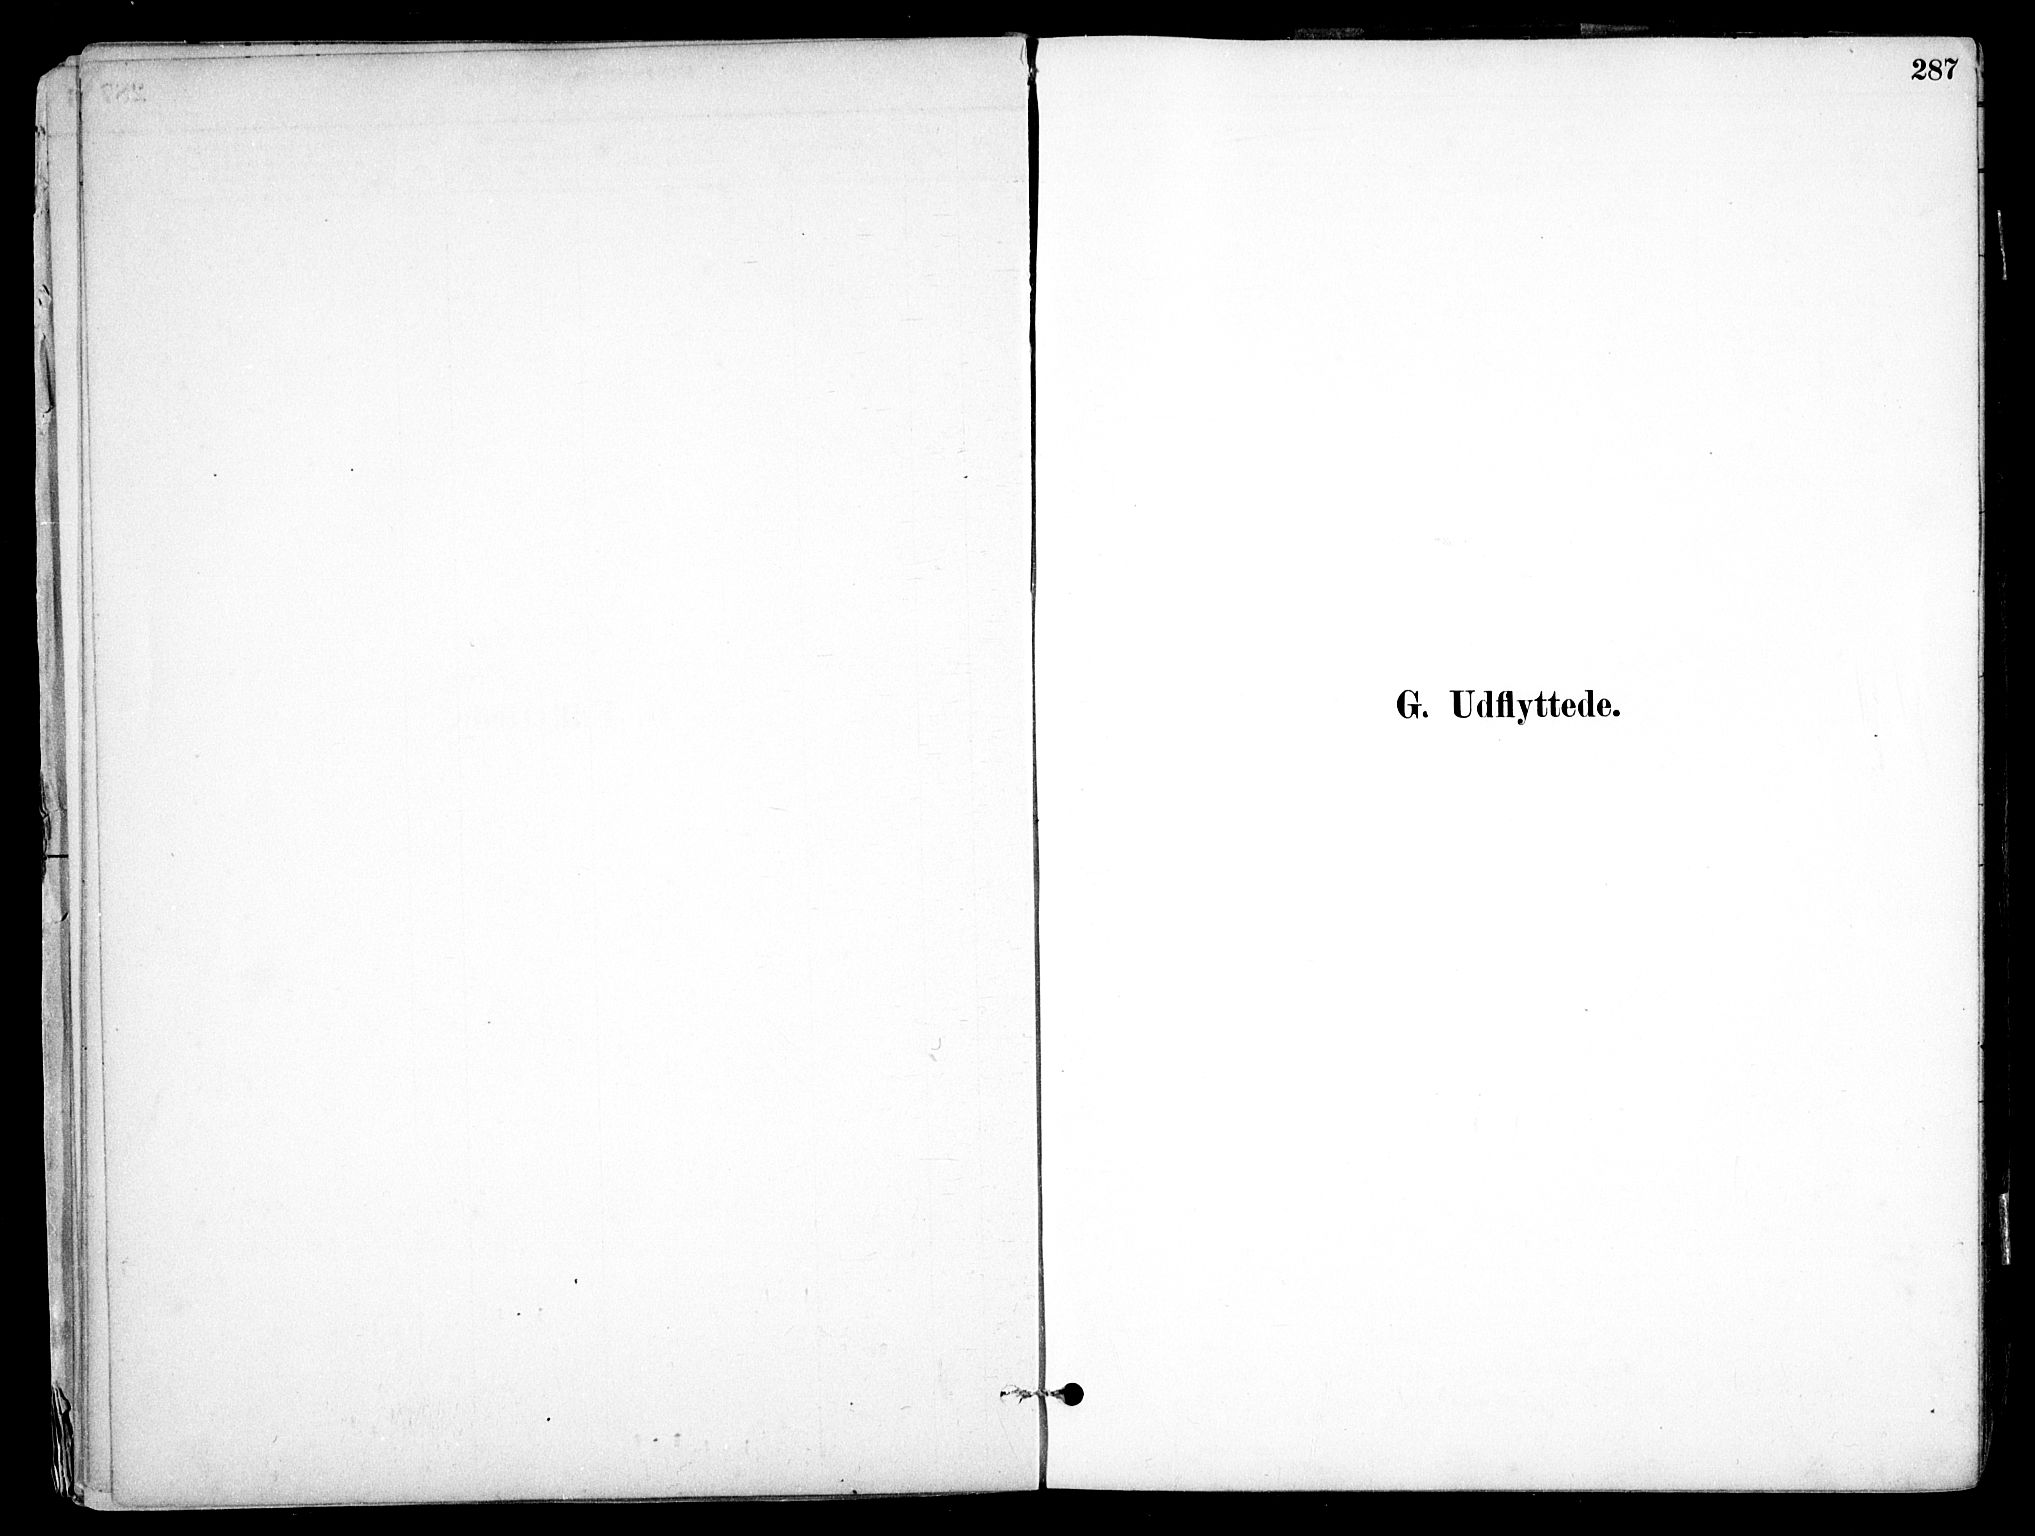 SAO, Nes prestekontor Kirkebøker, F/Fb/L0002: Ministerialbok nr. II 2, 1883-1918, s. 287